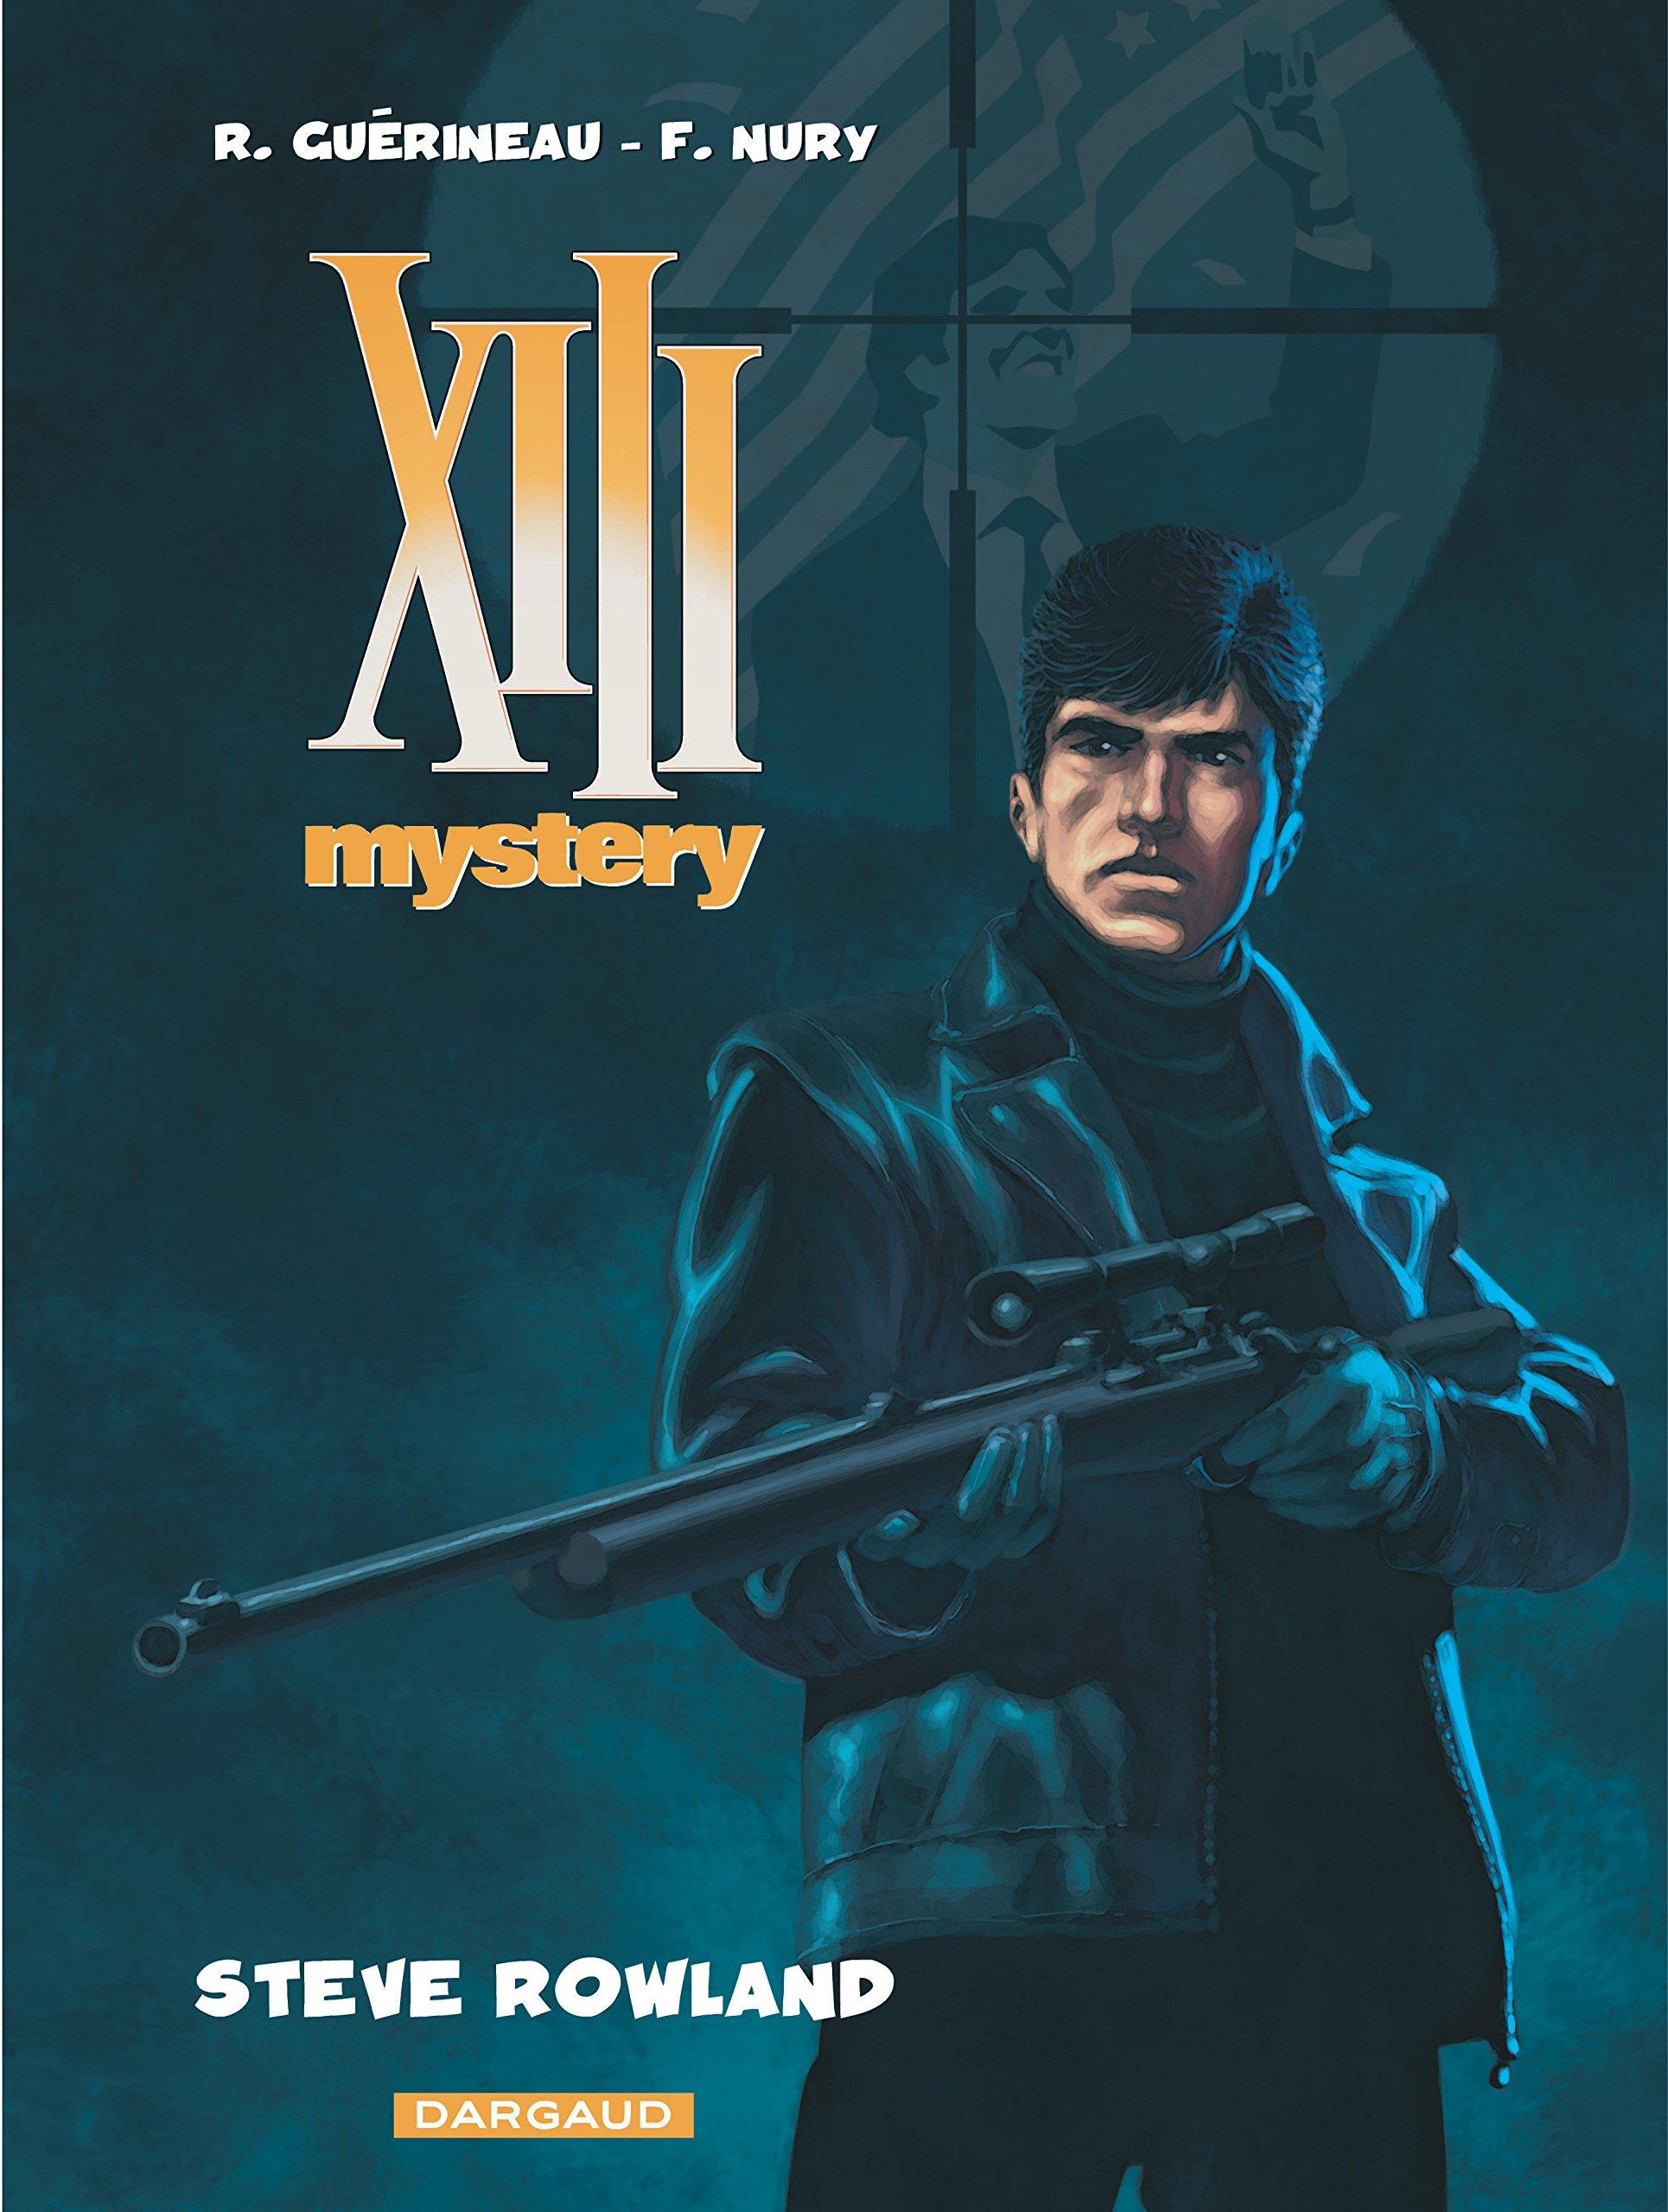 XIII Mystery, Tome 5 : Steve Rowland: Amazon.co.uk: Richard Guérineau,  Fabien Nury, Bérengère Marquebreucq: 9782505013433: Books